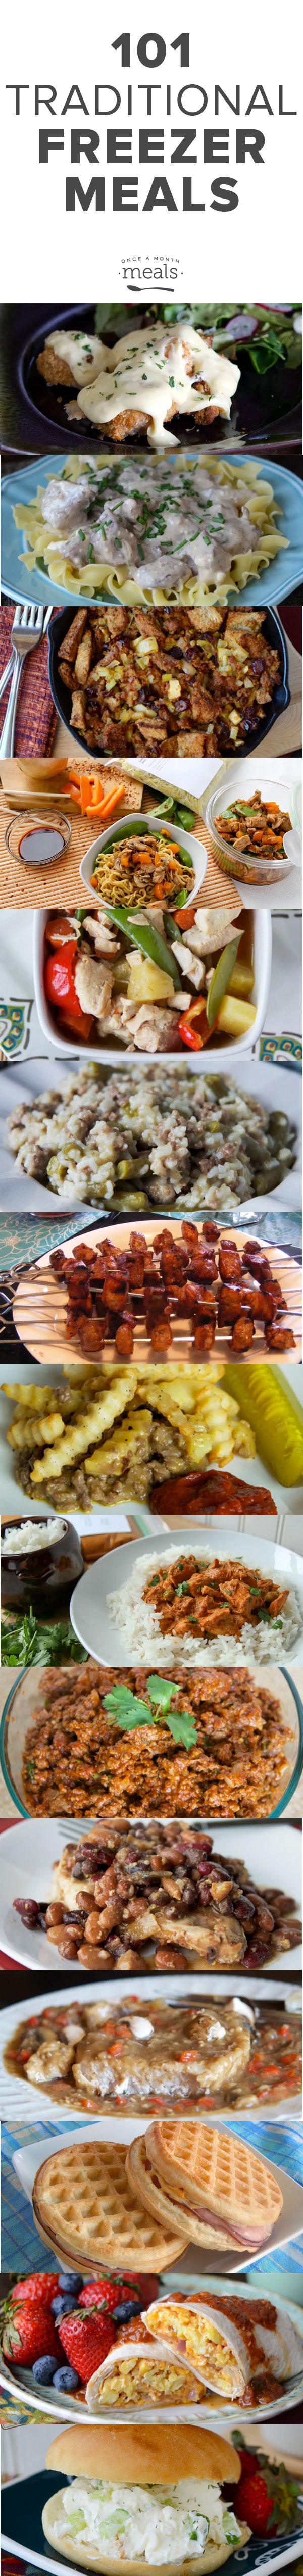 101 Traditional Freezer Meals